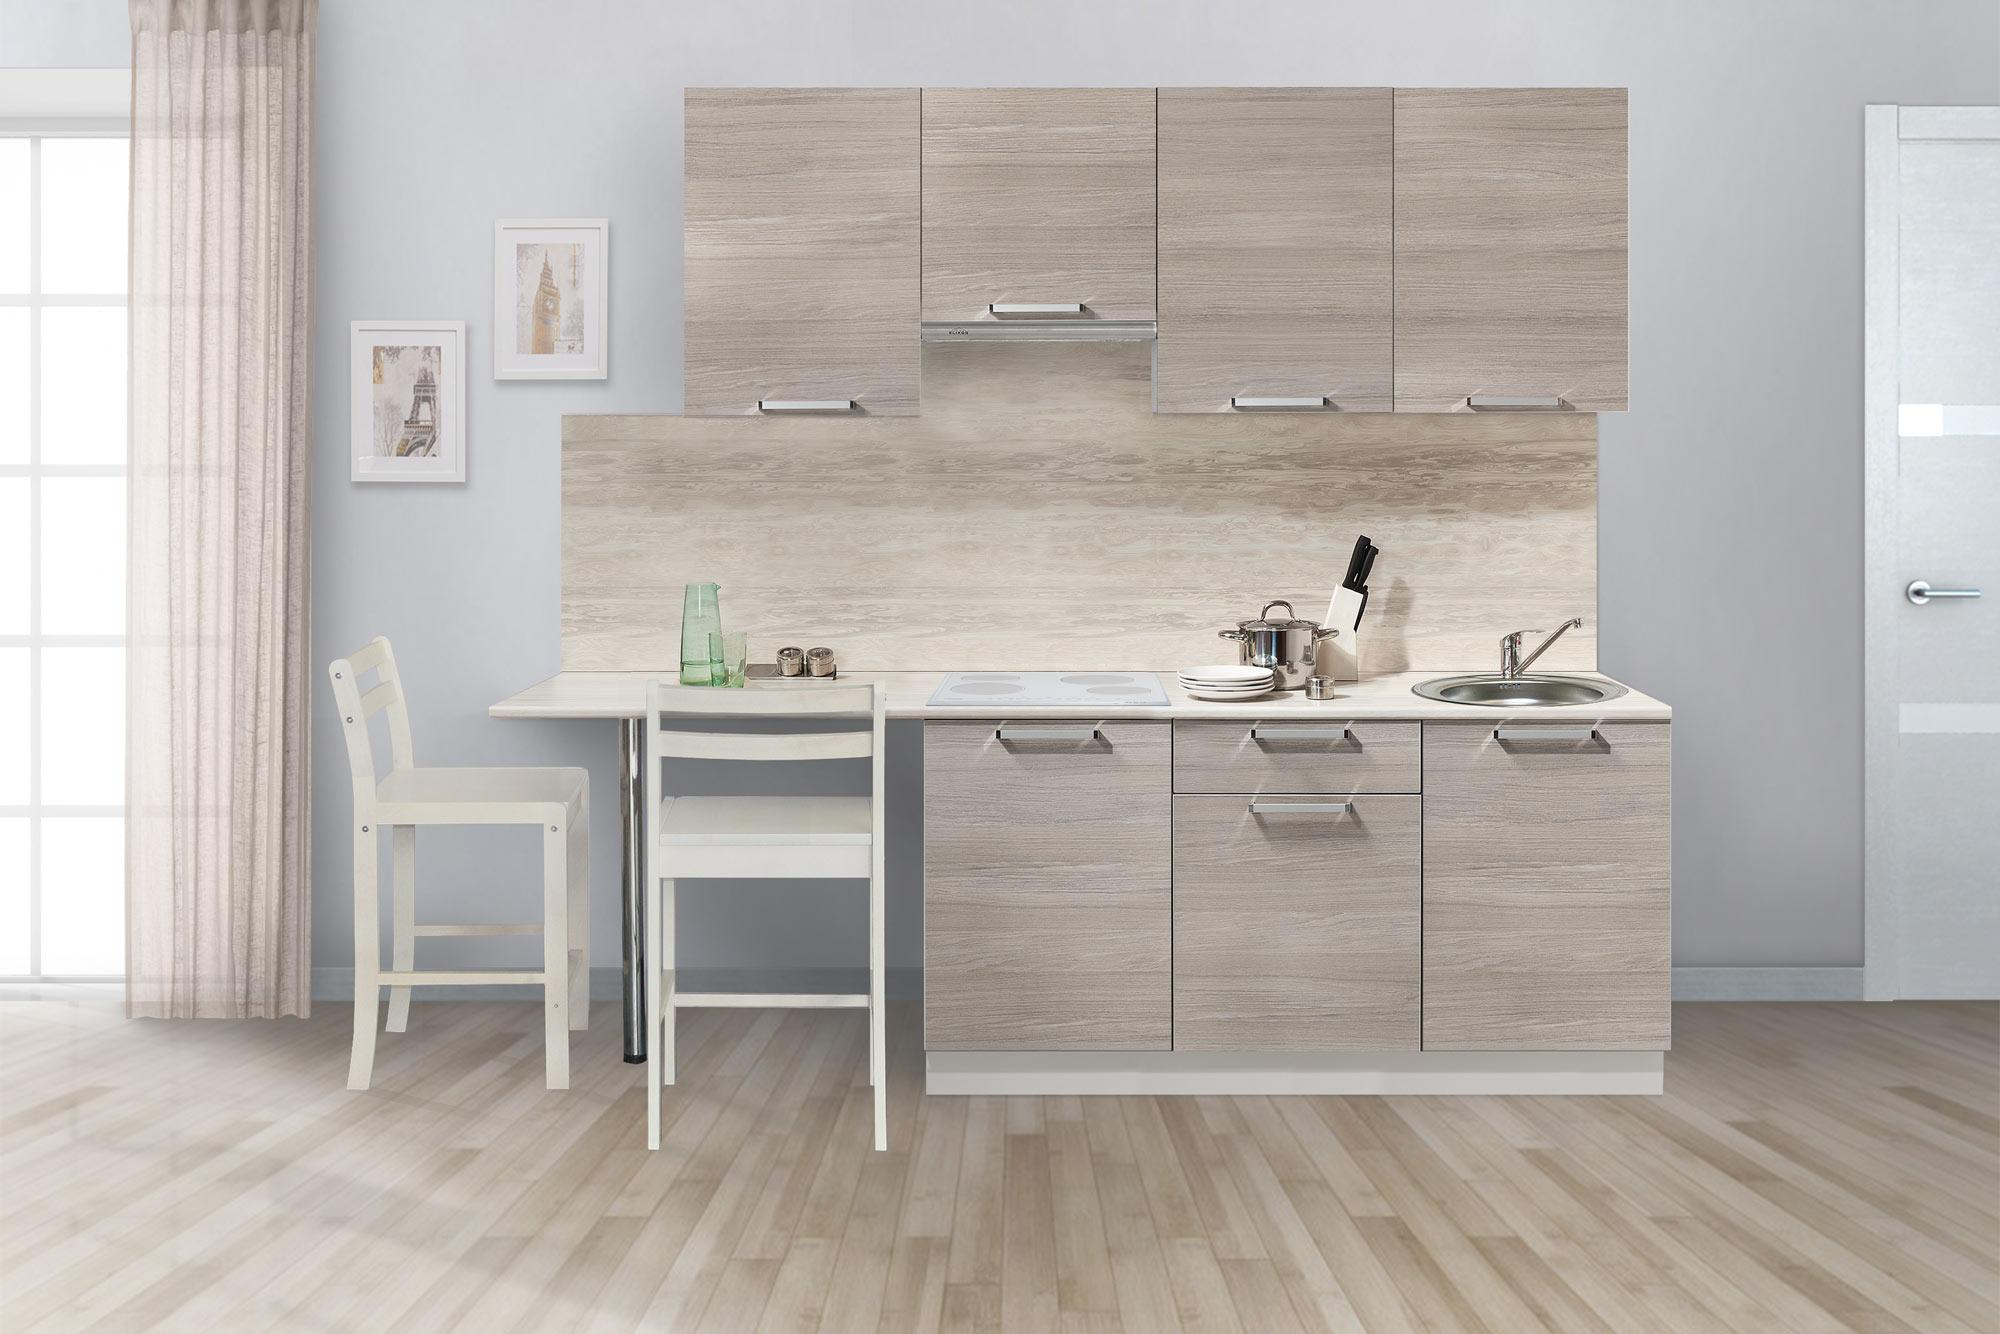 Кухонный гарнитур Симпл 2300 (I категория)